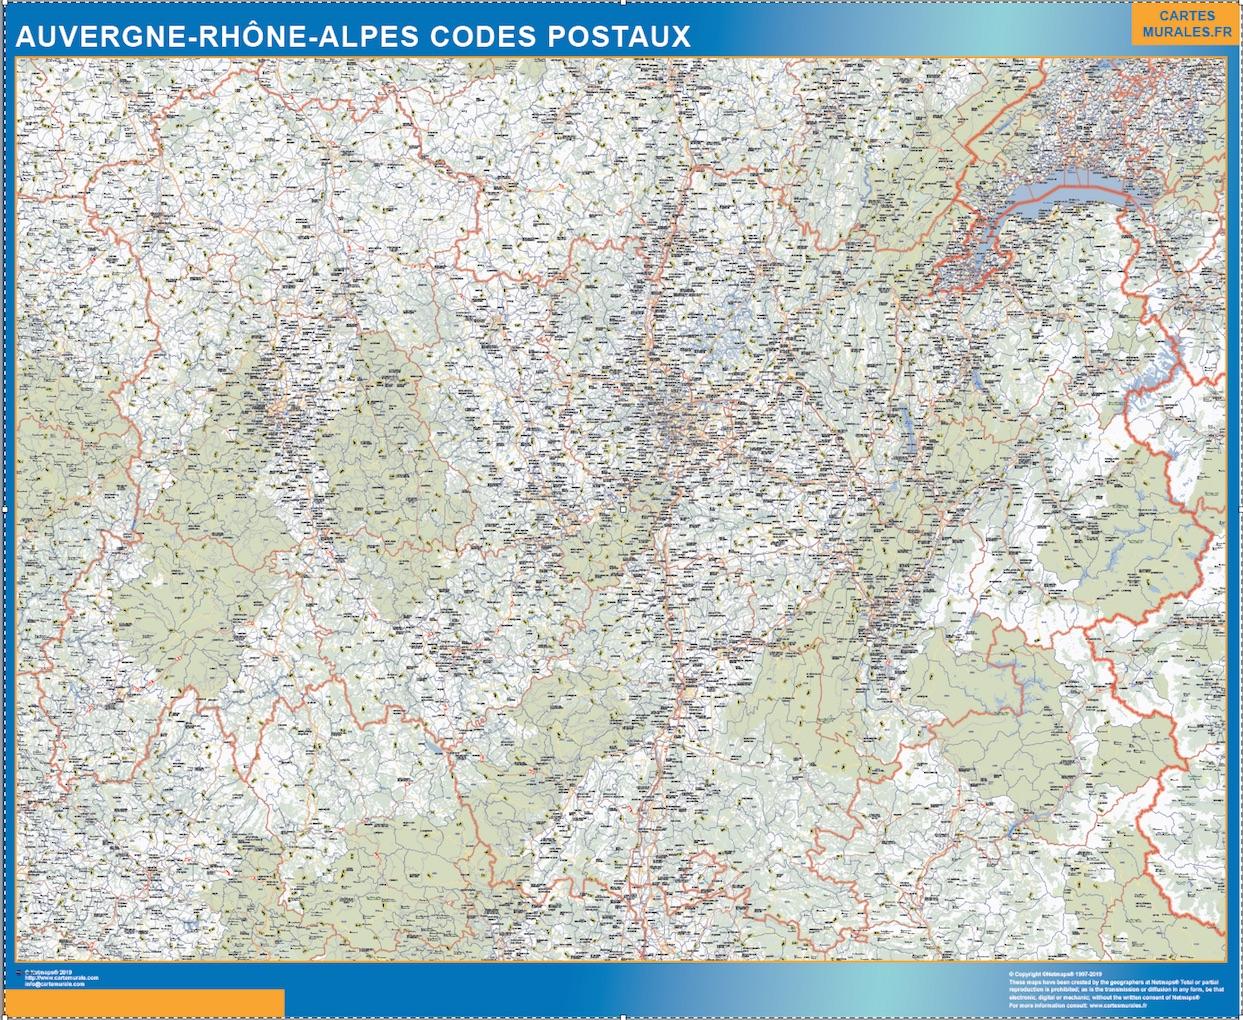 Carte Auvergne-Rhone-Alpes codes postaux